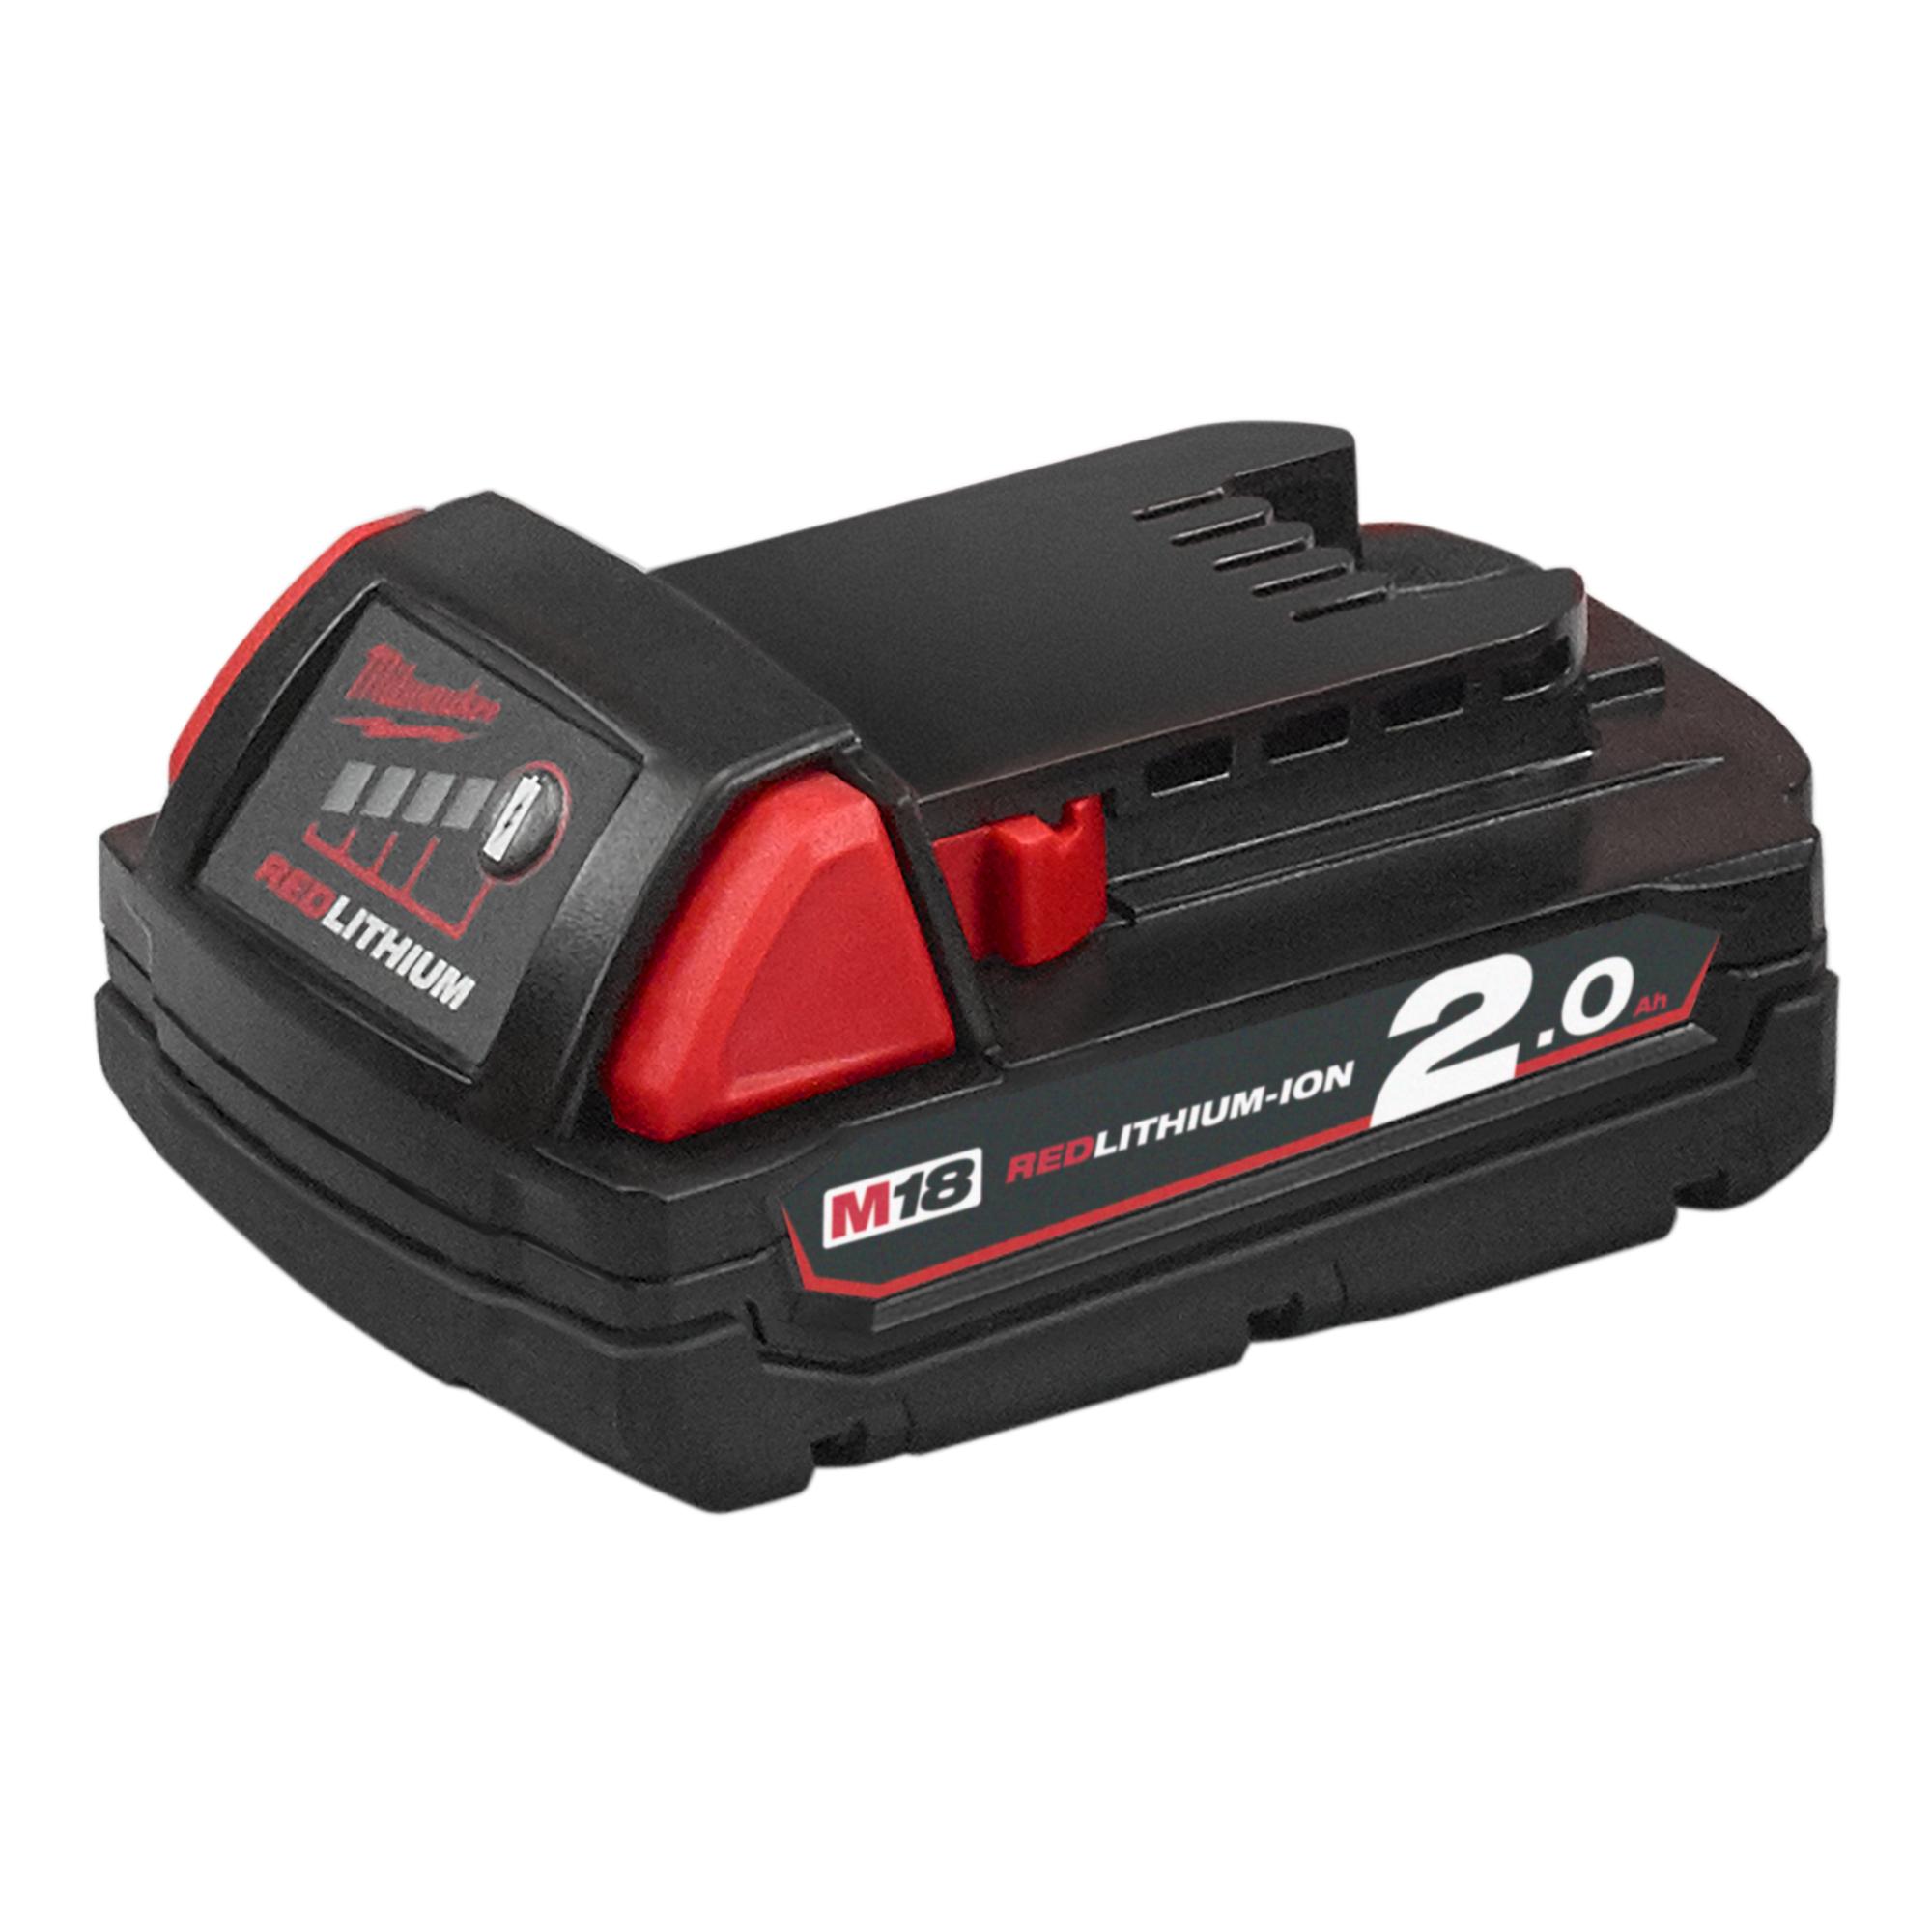 M18™ akumulator 2.0 Ah